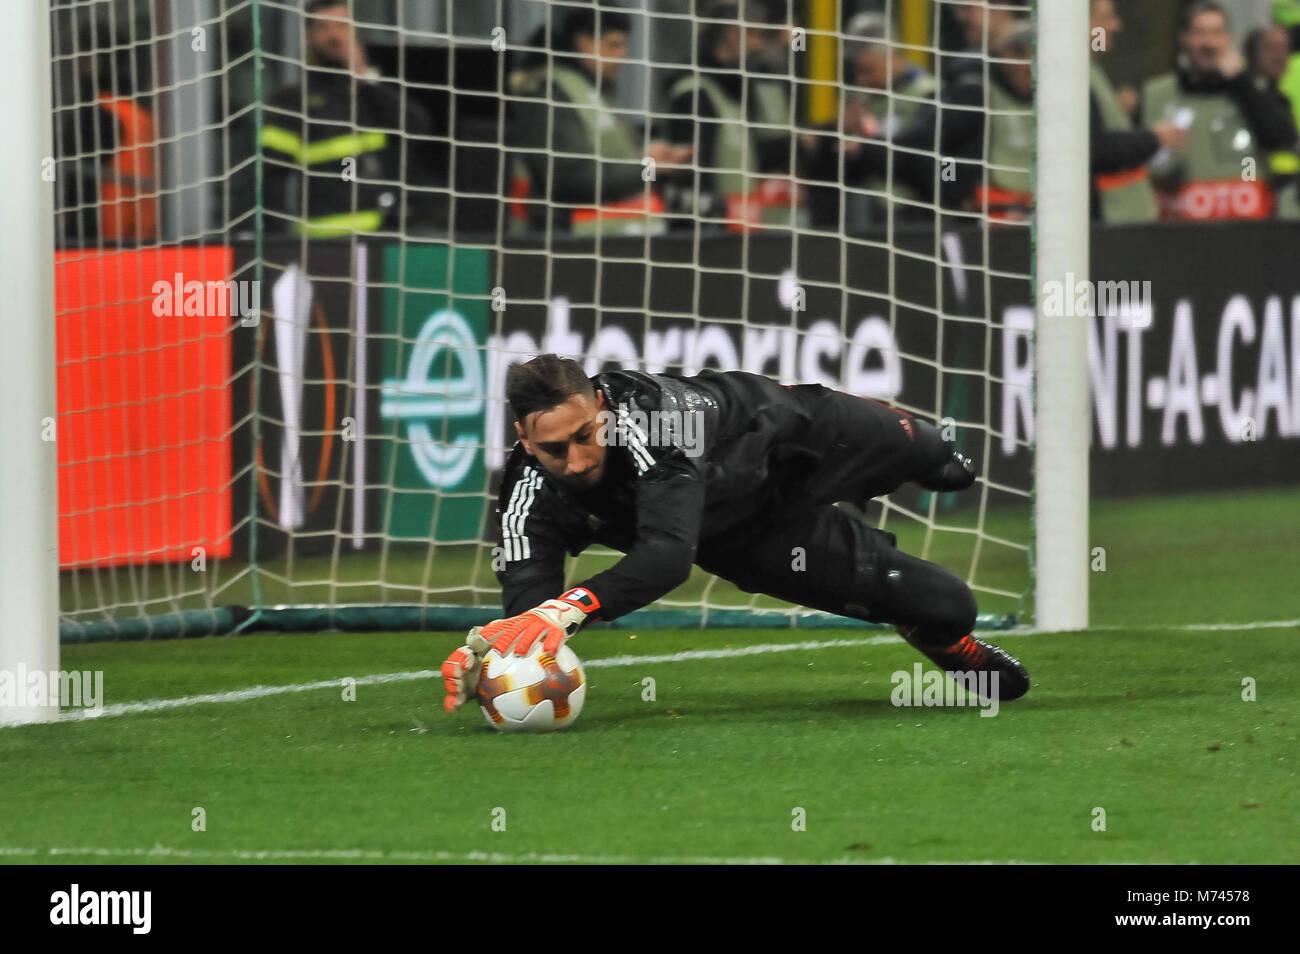 Milan, Italy. 8th March, 2018. Gianluigi Donnarumma (AC Milan) during the match UEFA Europa League between AC Milan Stock Photo